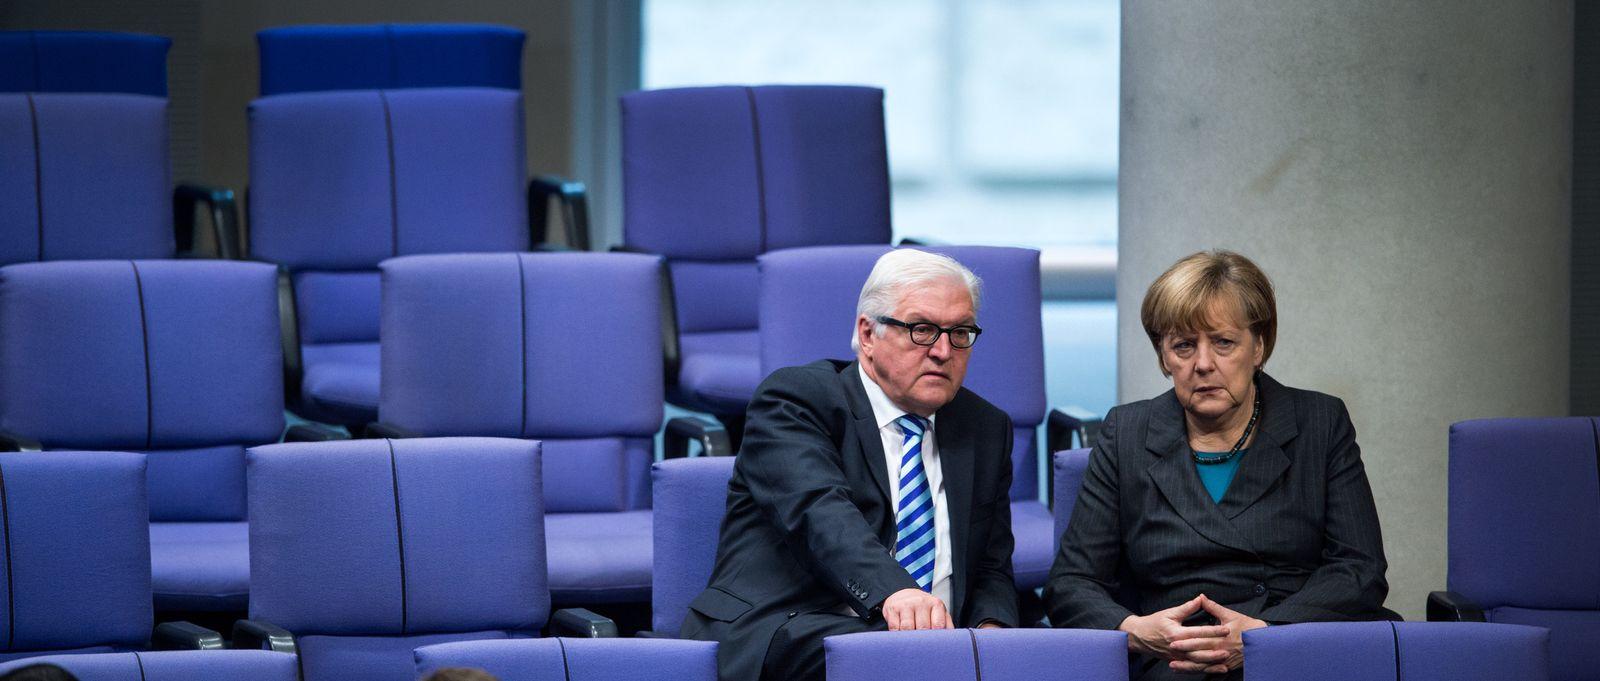 Merkel / Steinmeier